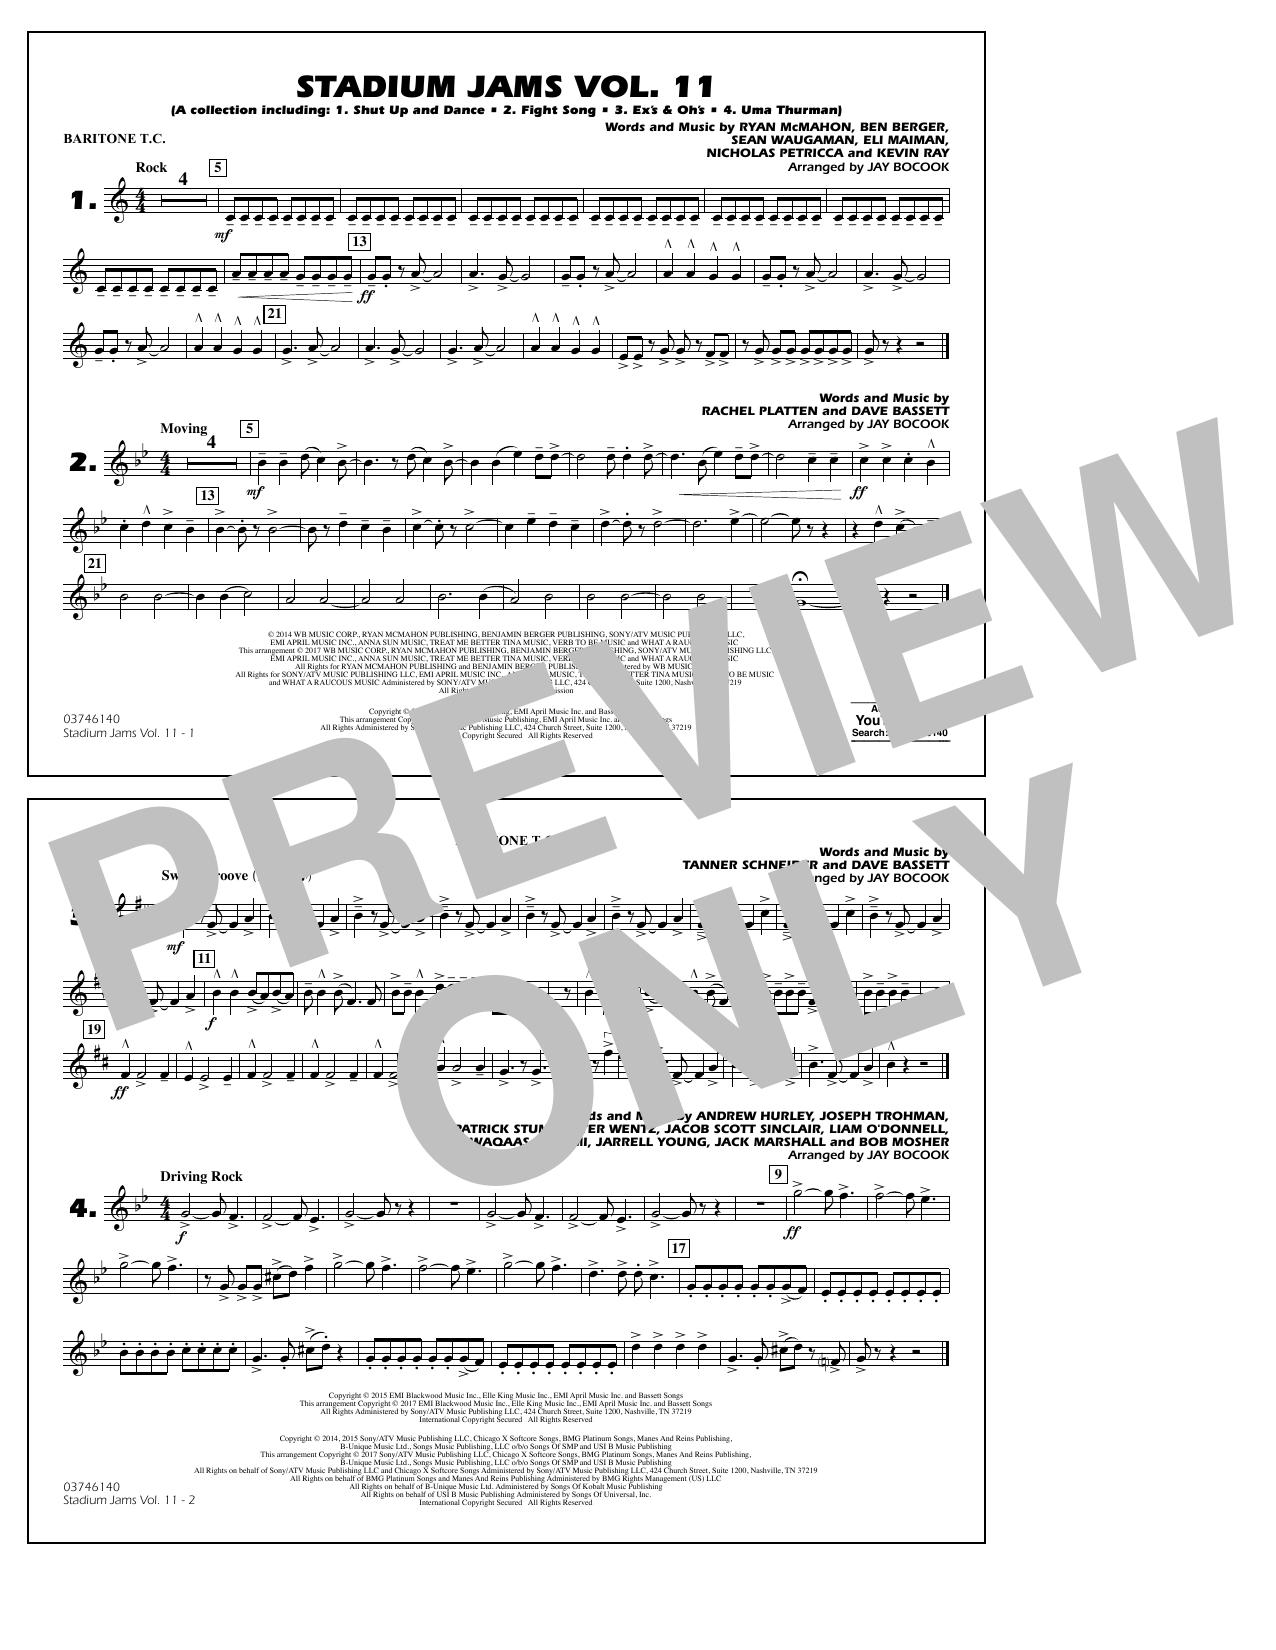 Stadium Jams Volume 11 - Baritone T.C. Sheet Music